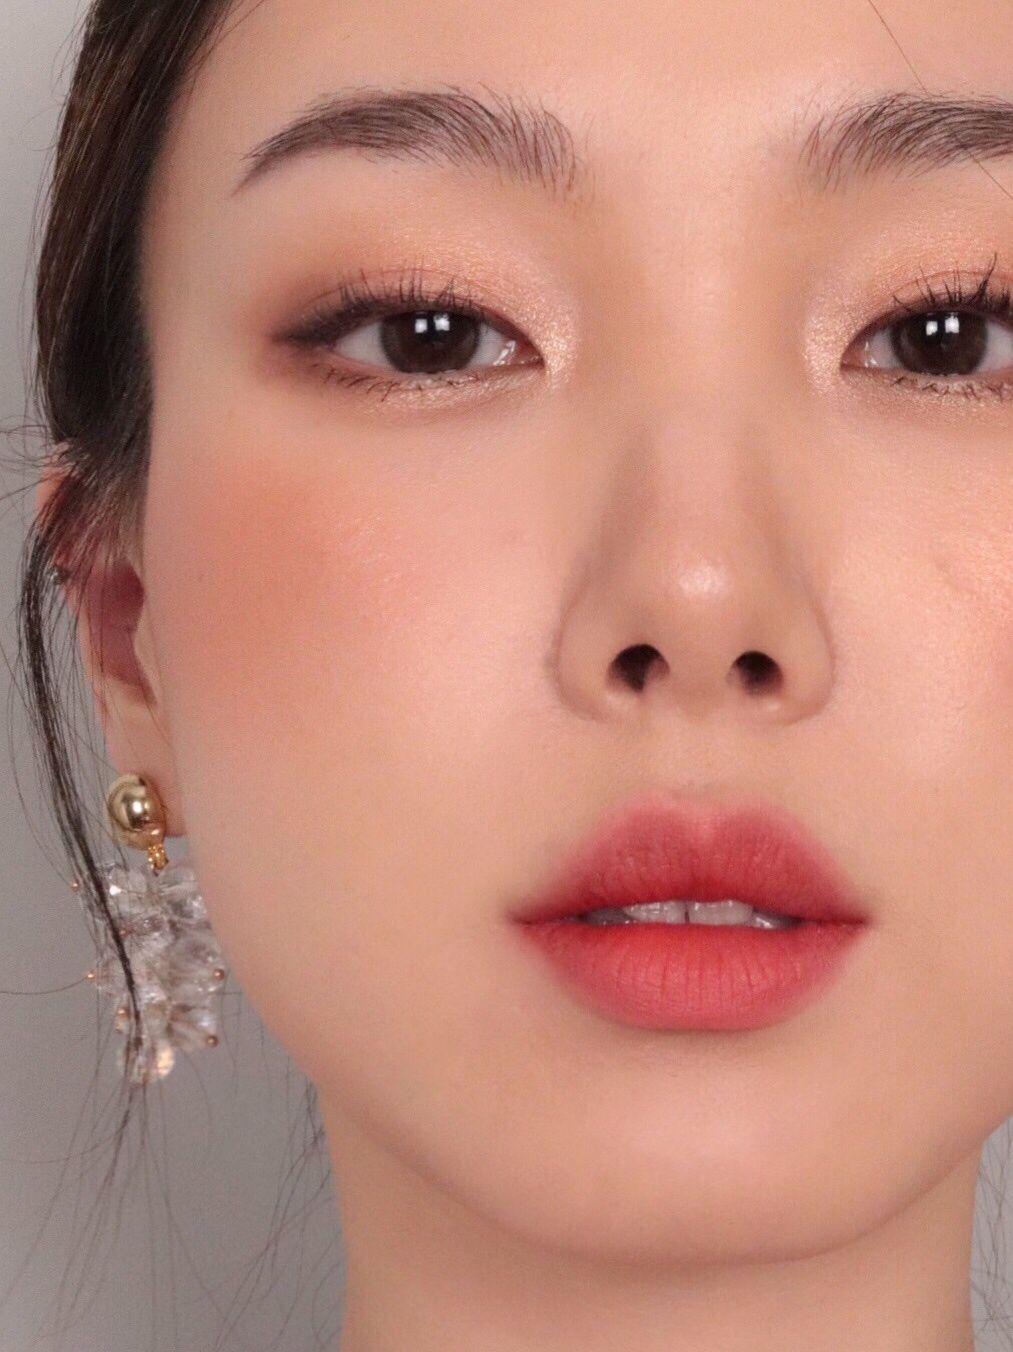 Korean Koreanmakeup Kbeauty Chanelbeauty Chanel Makeuplooks